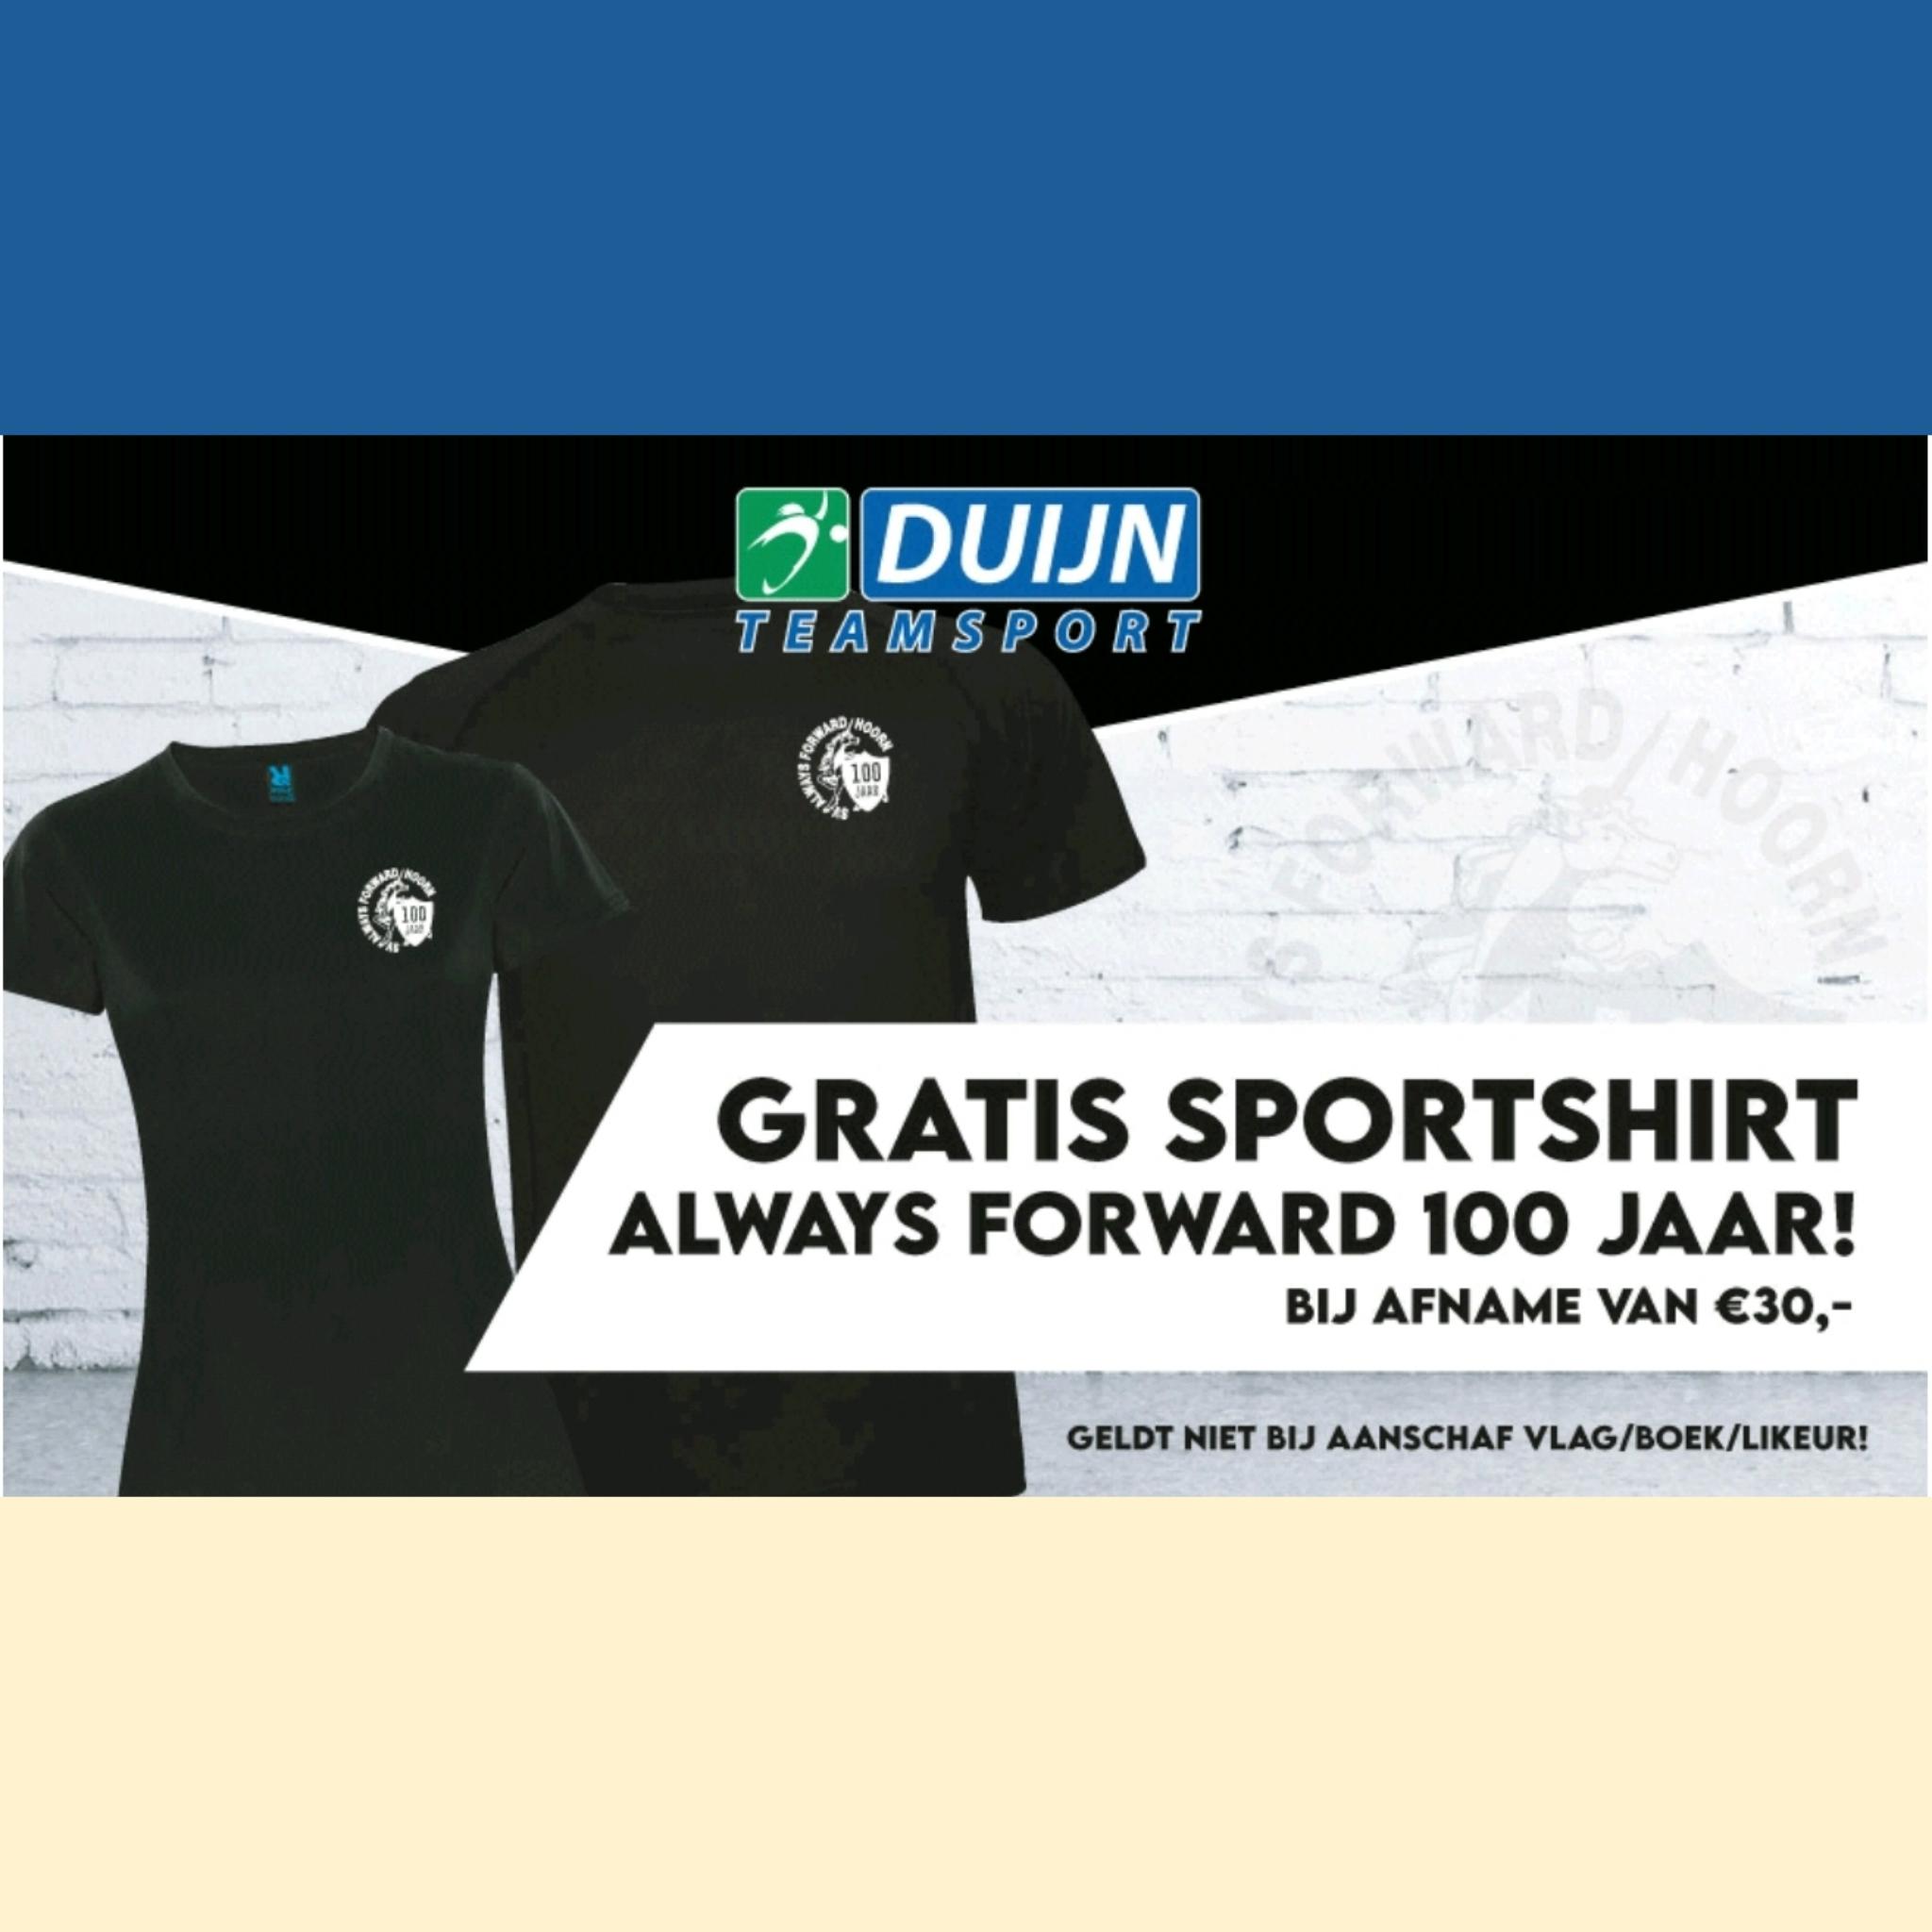 Gratis jubileum shirt!